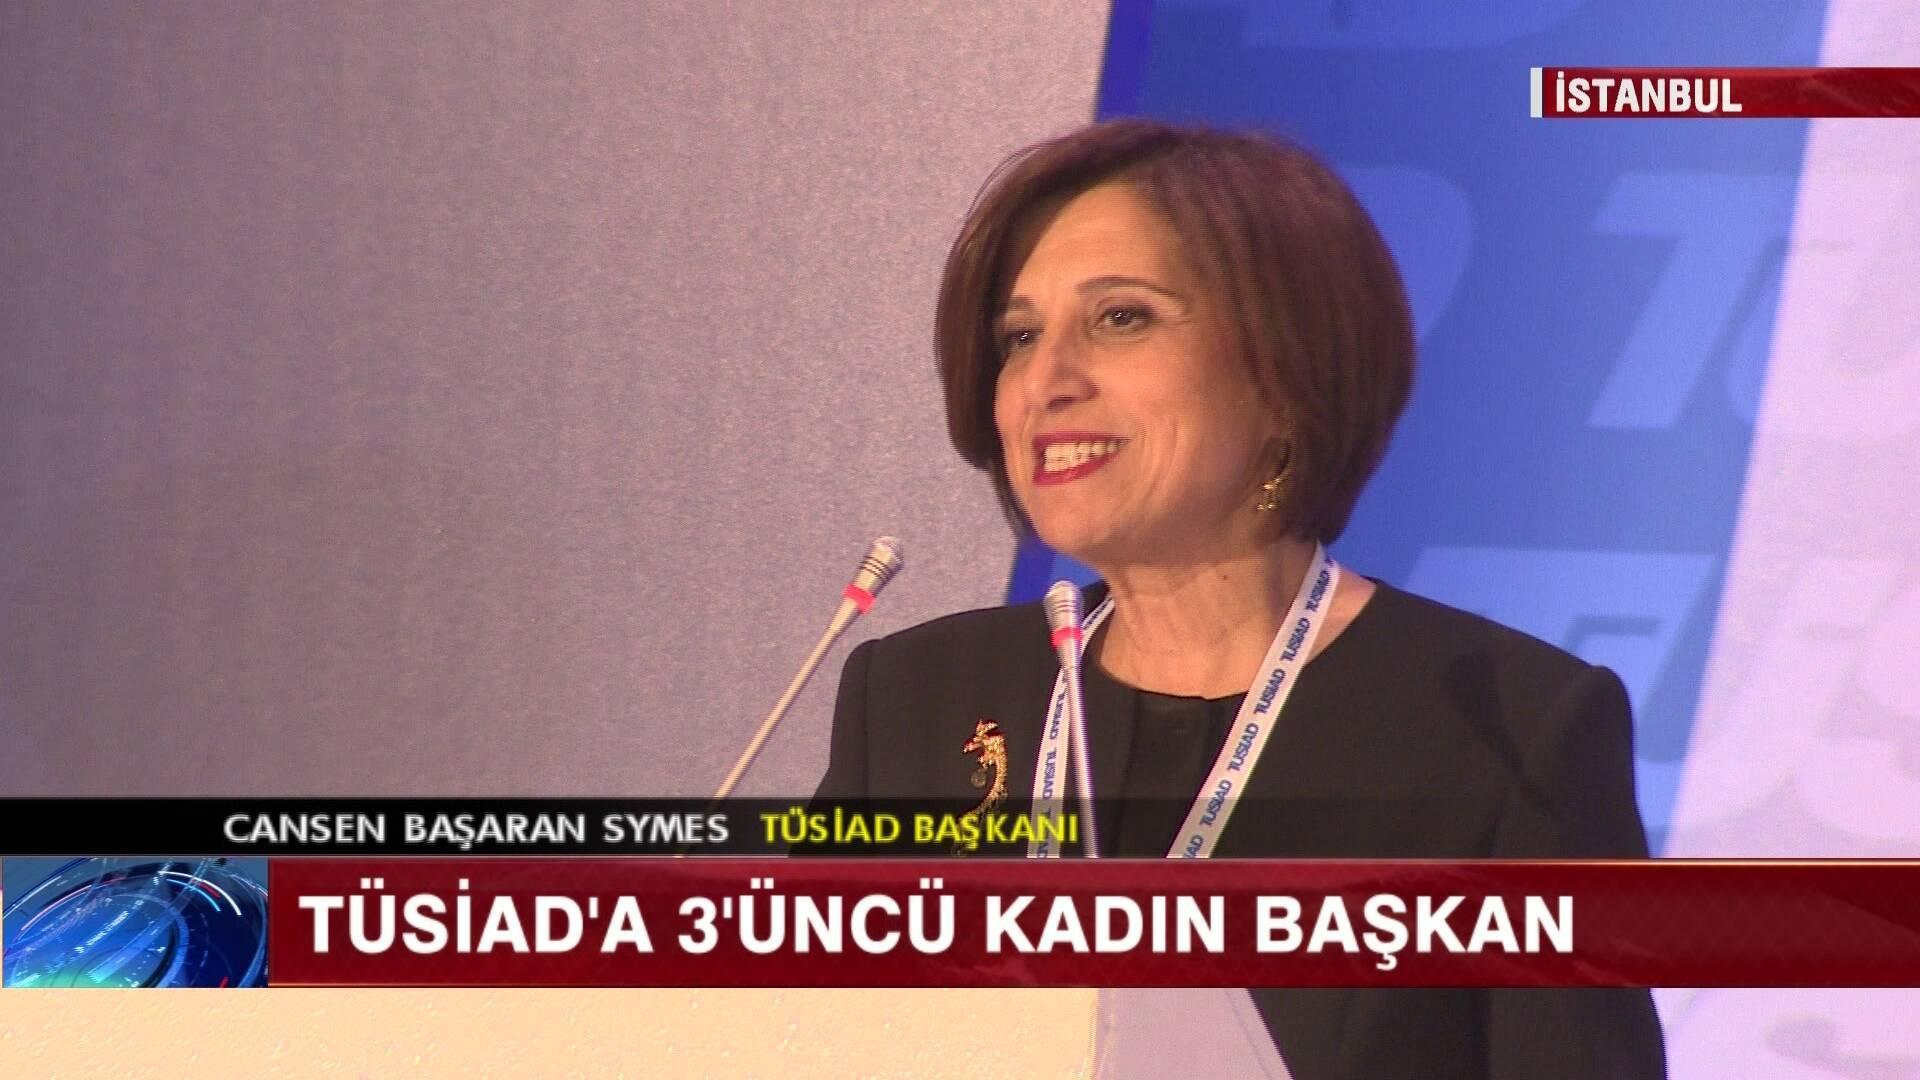 Üçüncü kez kadın başkan!